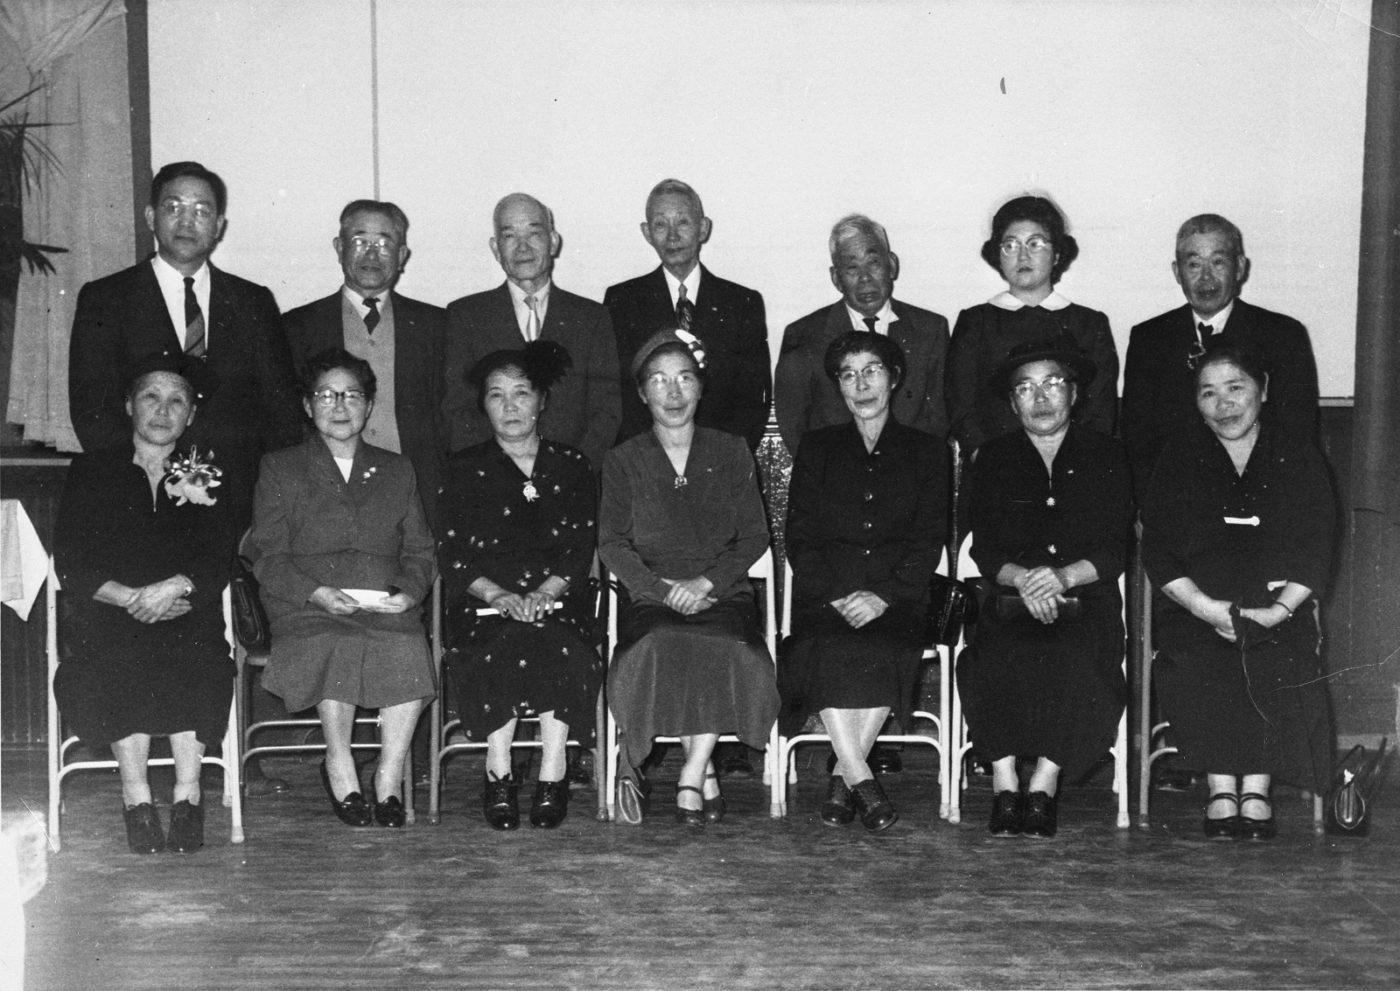 Japanese Citizenship Class in Longmont 1953